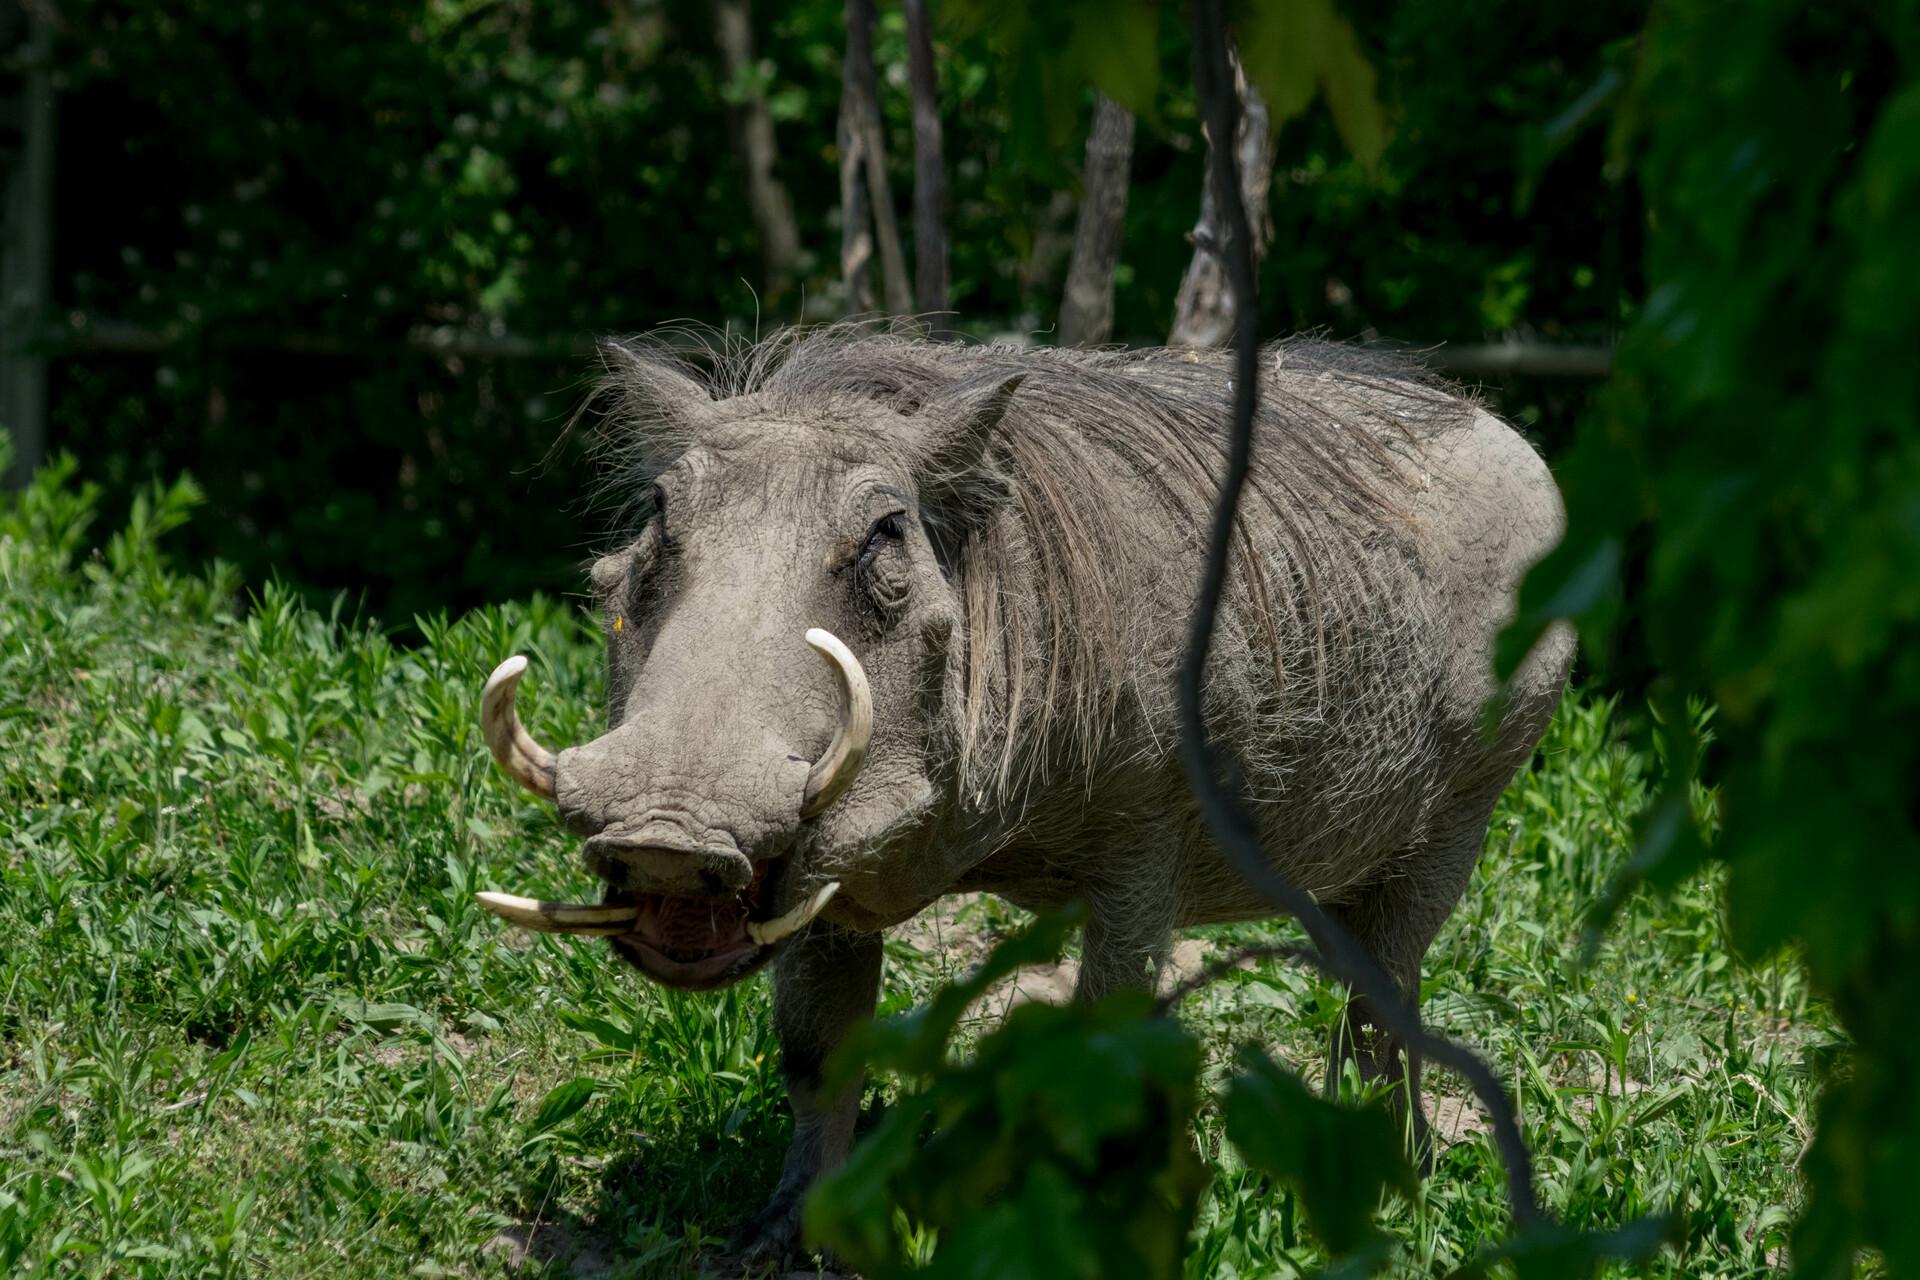 Mustafa kazmi may 30th 2018 toronto zoo 173